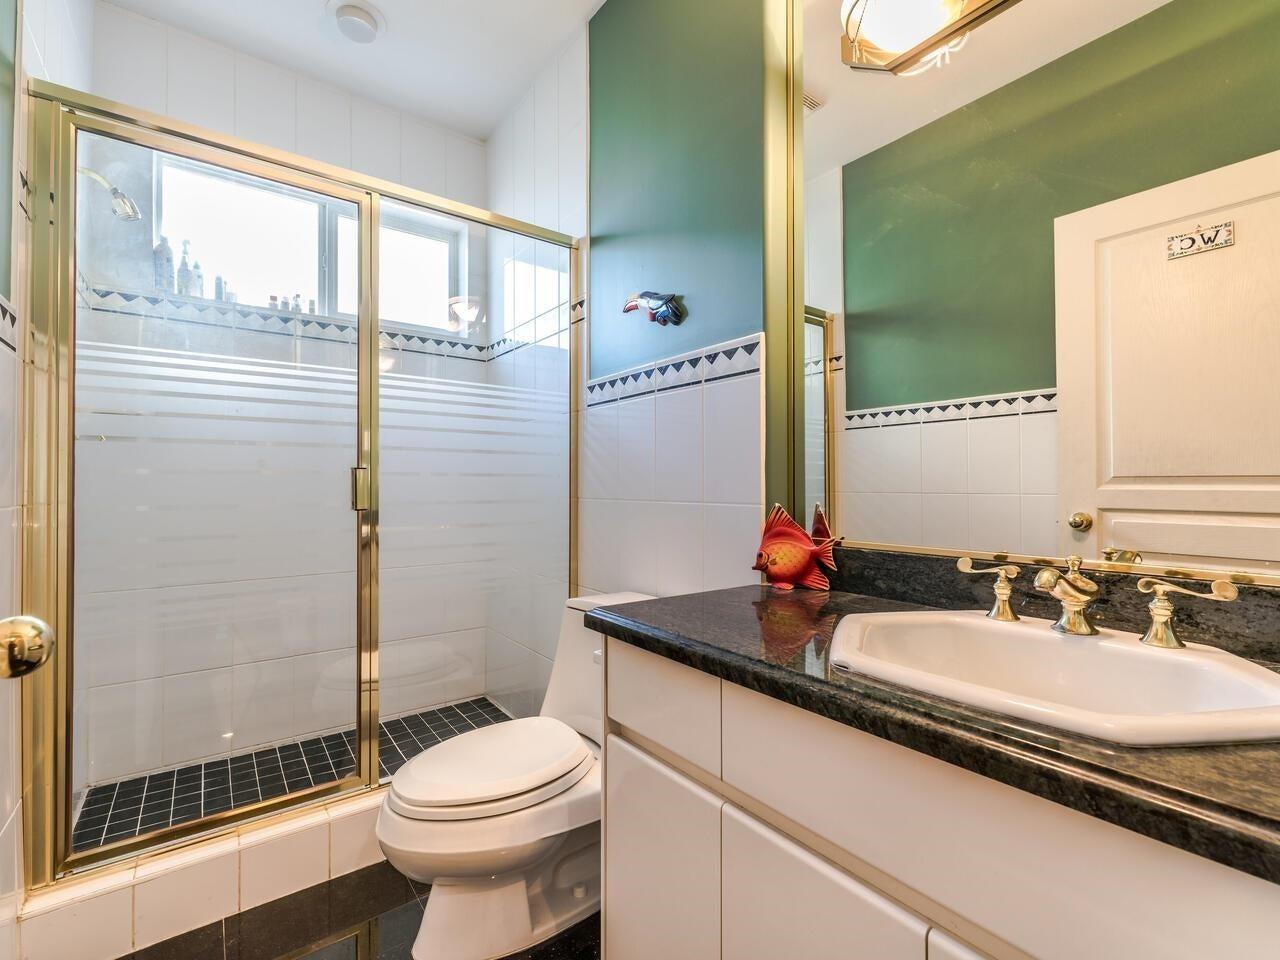 7888 JASPER CRESCENT - Fraserview VE House/Single Family for sale, 7 Bedrooms (R2622945) - #13